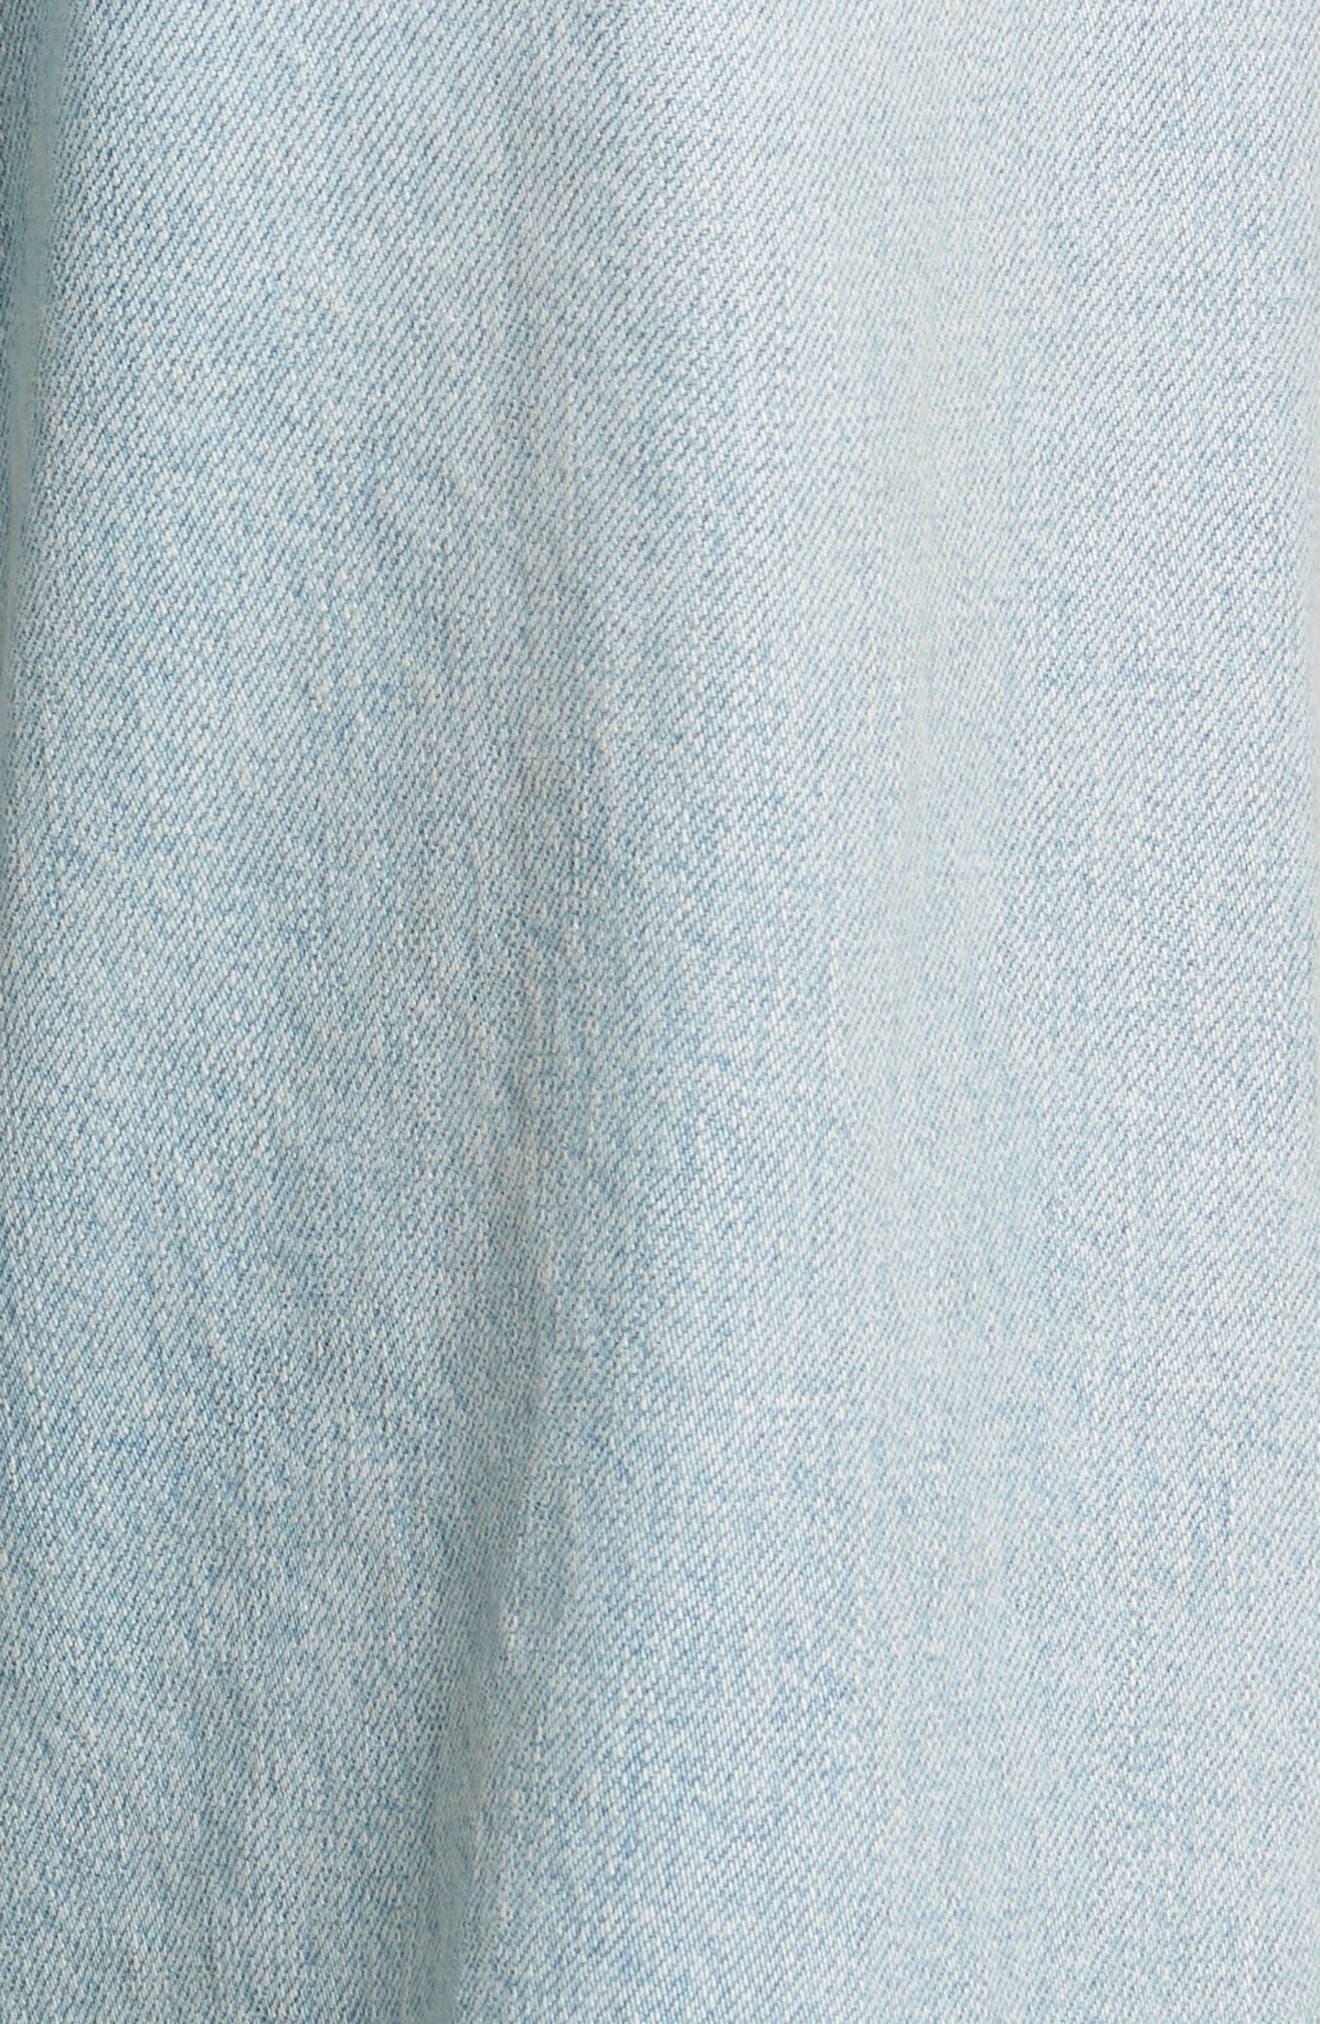 Tibbee Ripped Jeans,                             Alternate thumbnail 6, color,                             Light Indigo